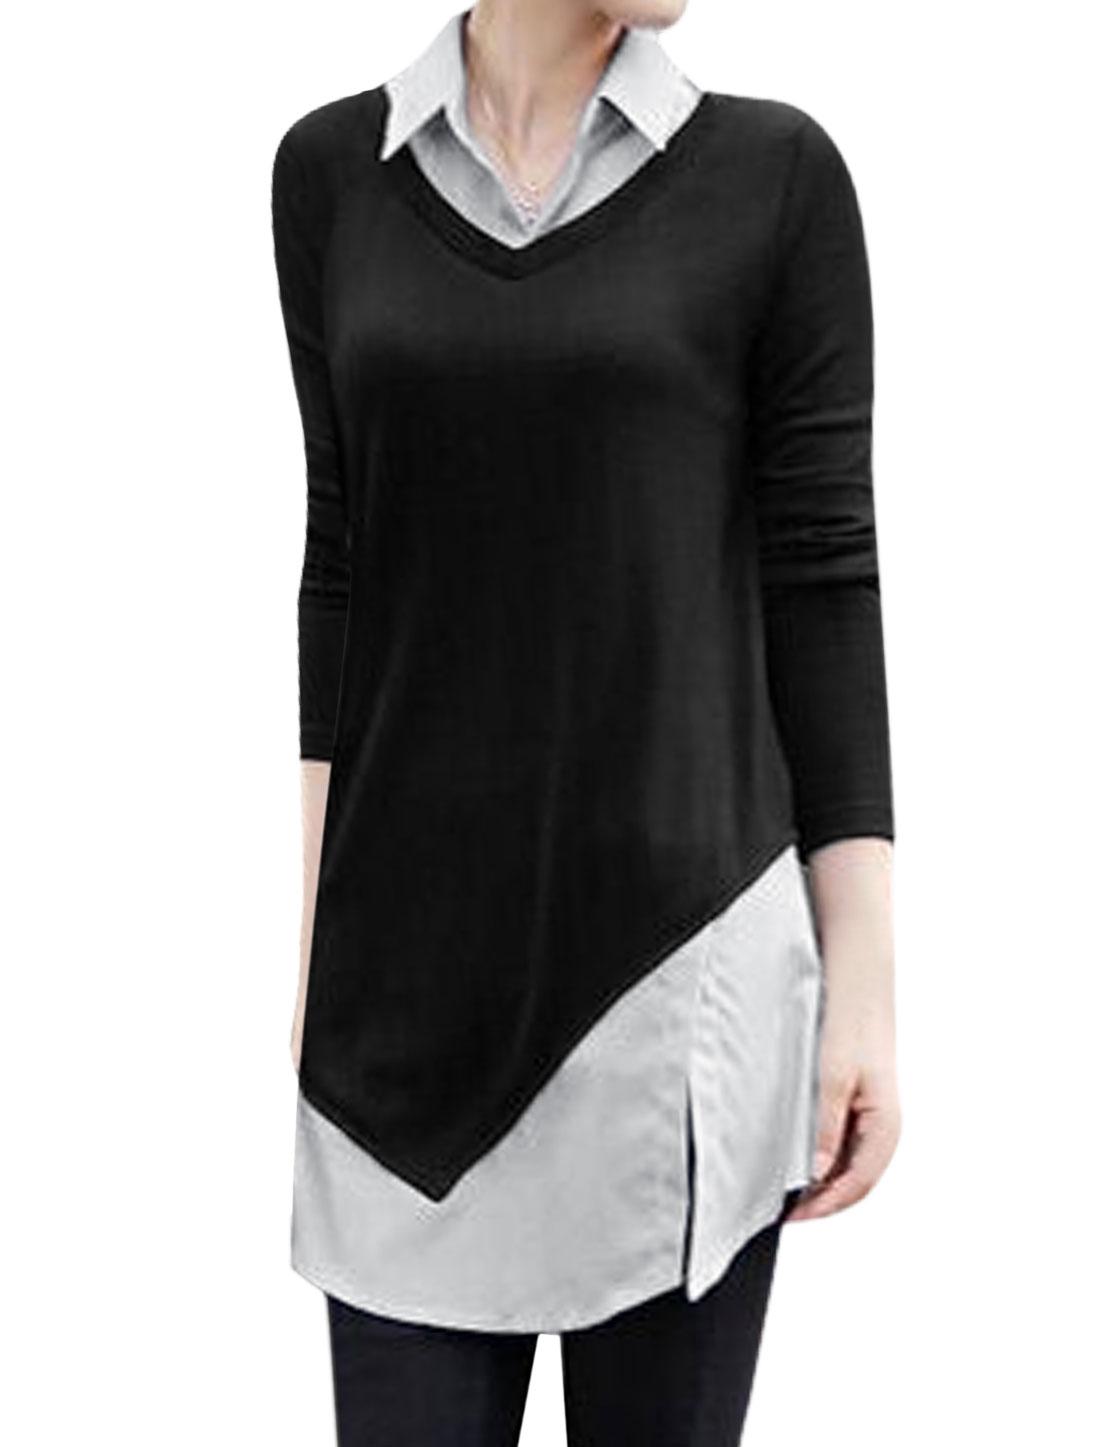 Women Panel Design Shirttail Tunic Top White Black S